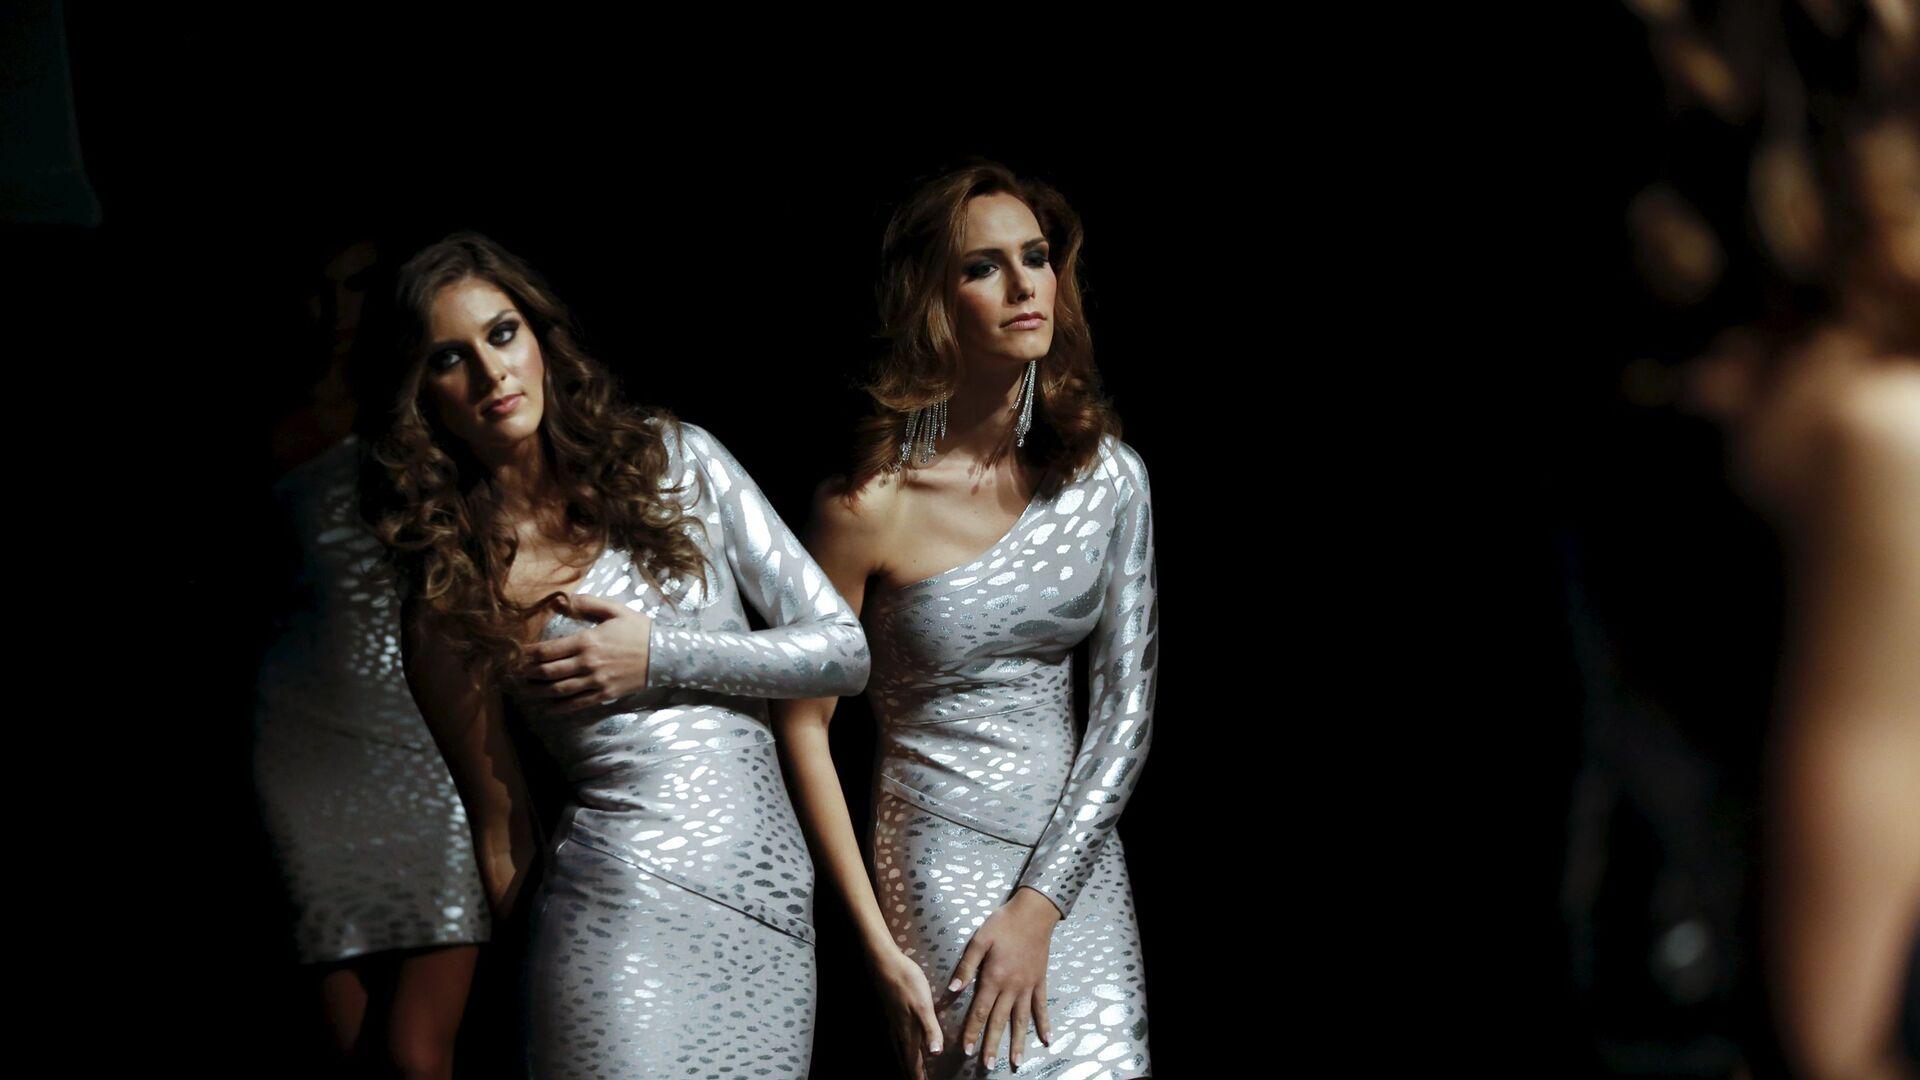 Транссексуал Ангела Понсе (справа) претендует на звание Мисс Мира от Испании - Sputnik Italia, 1920, 10.06.2021